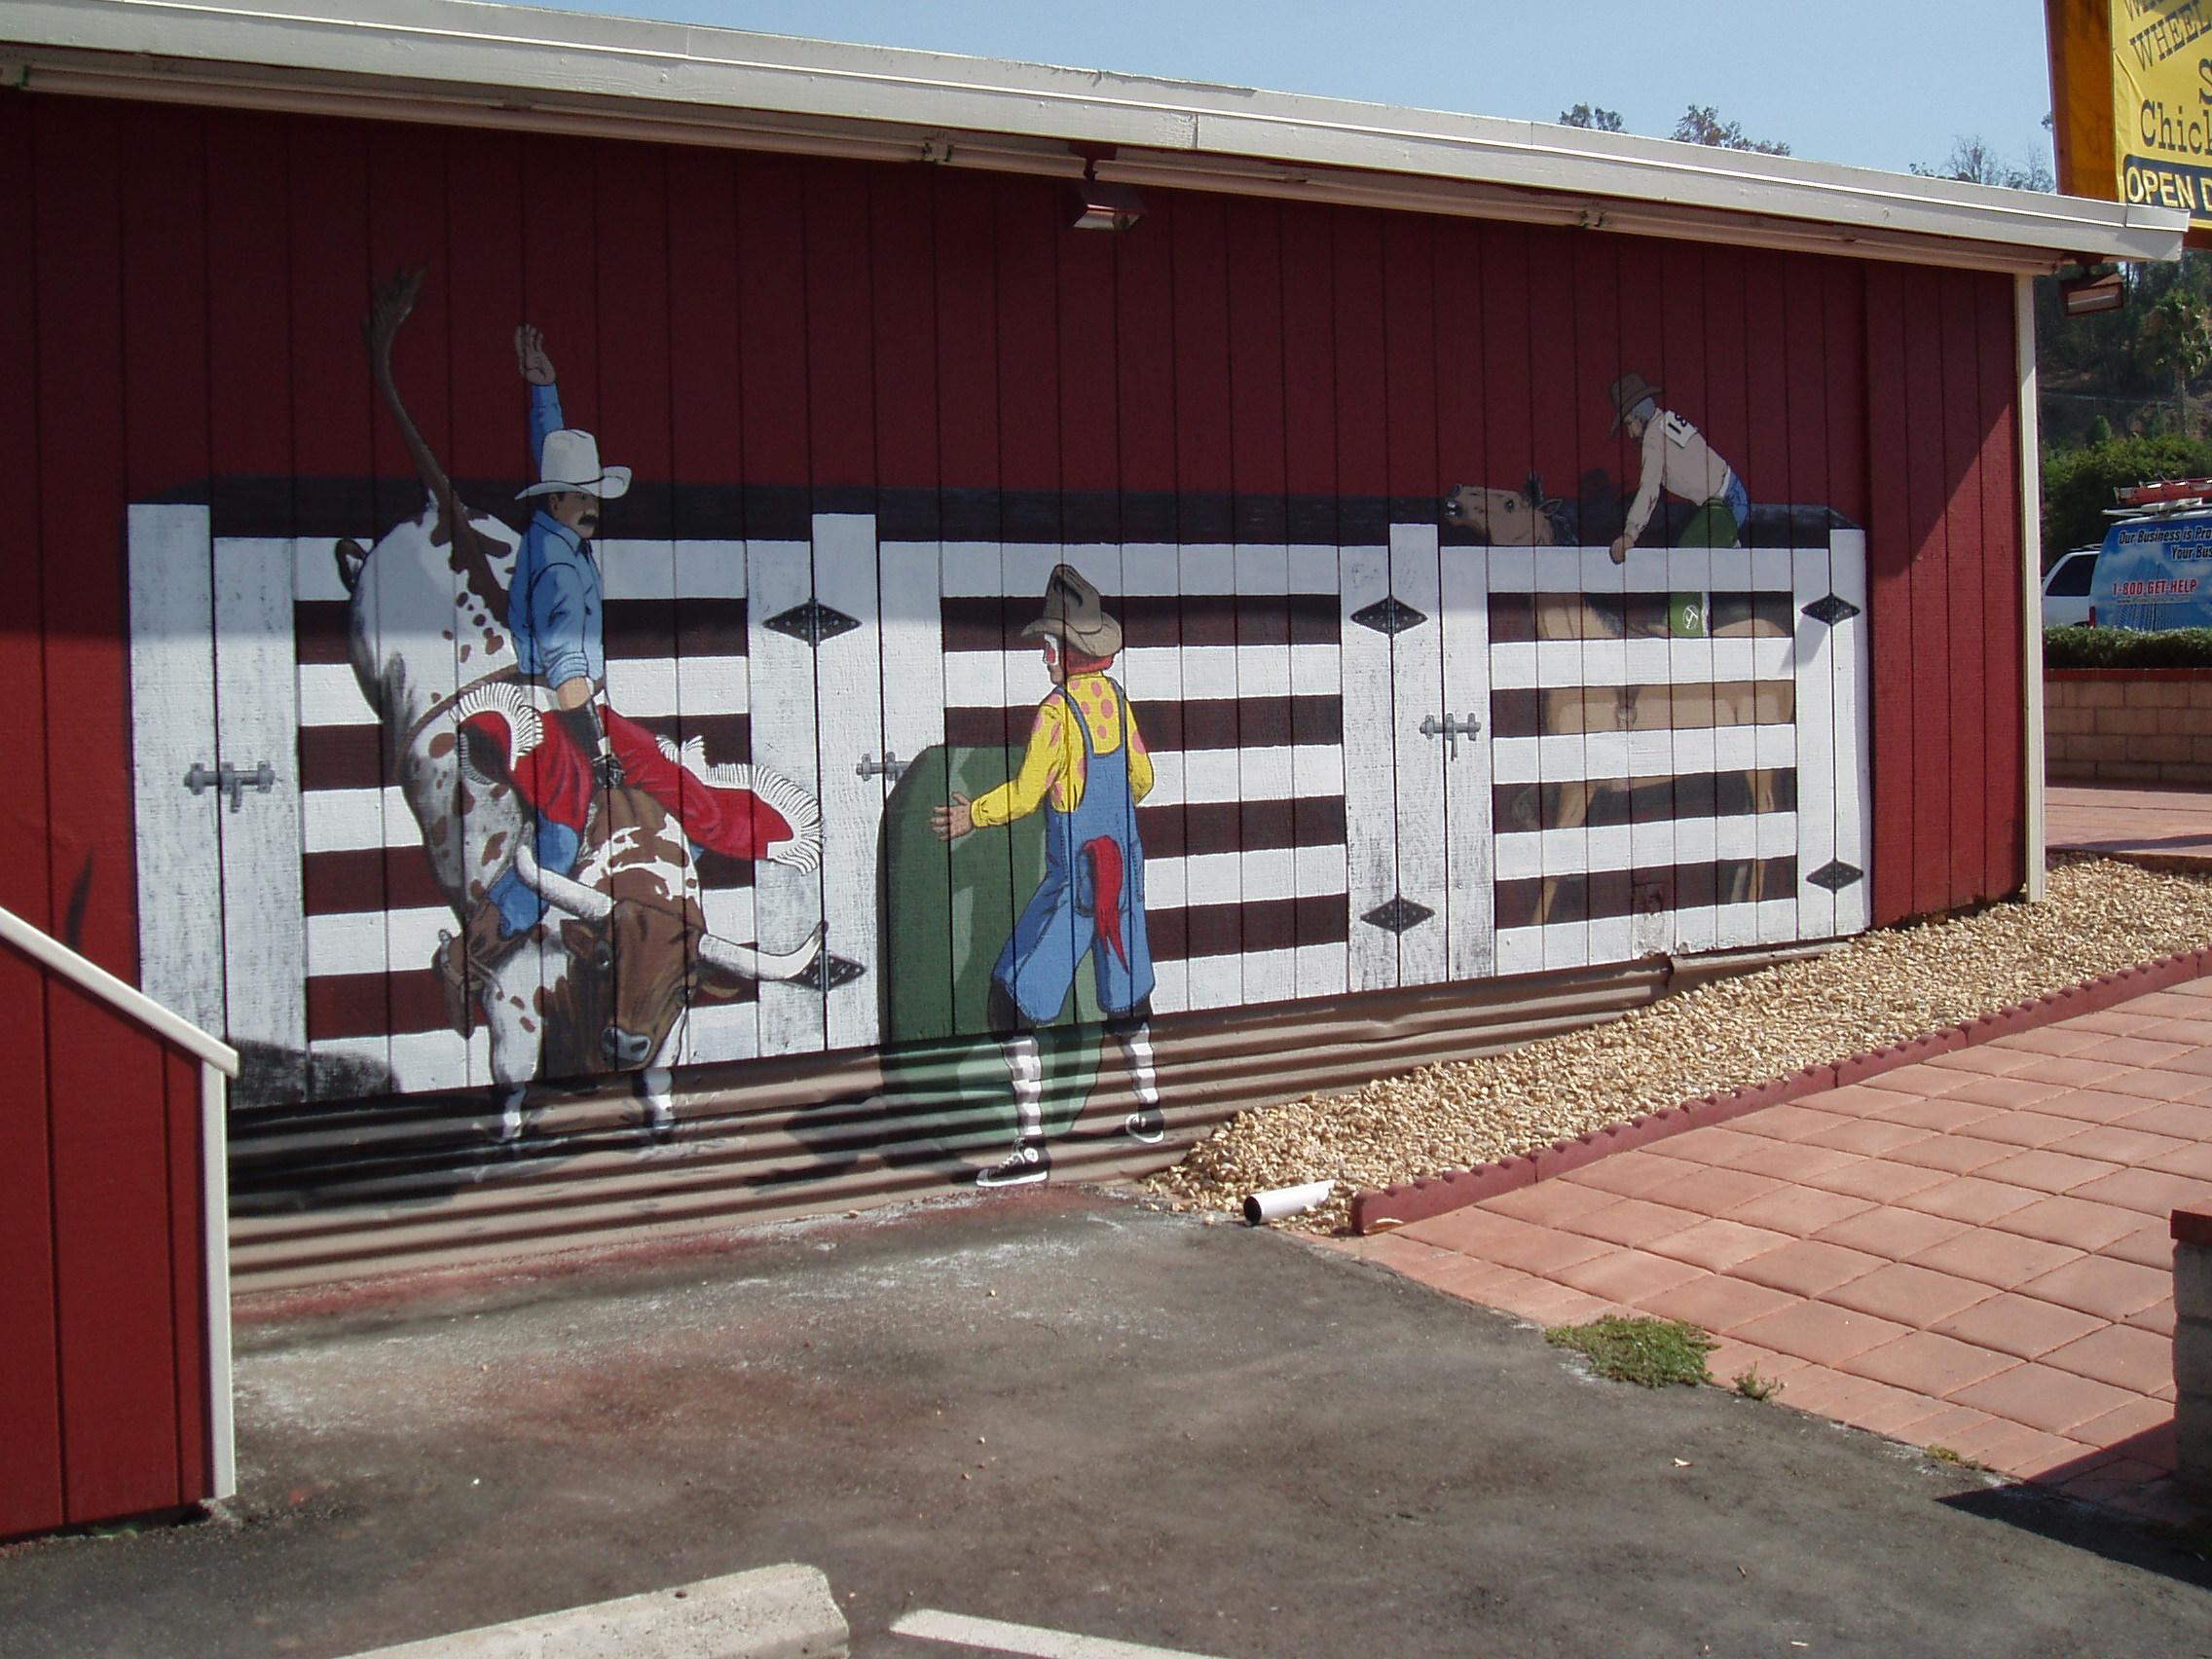 Western Mural Wagon Wheel Restaurant exterior Santee California 7.JPG